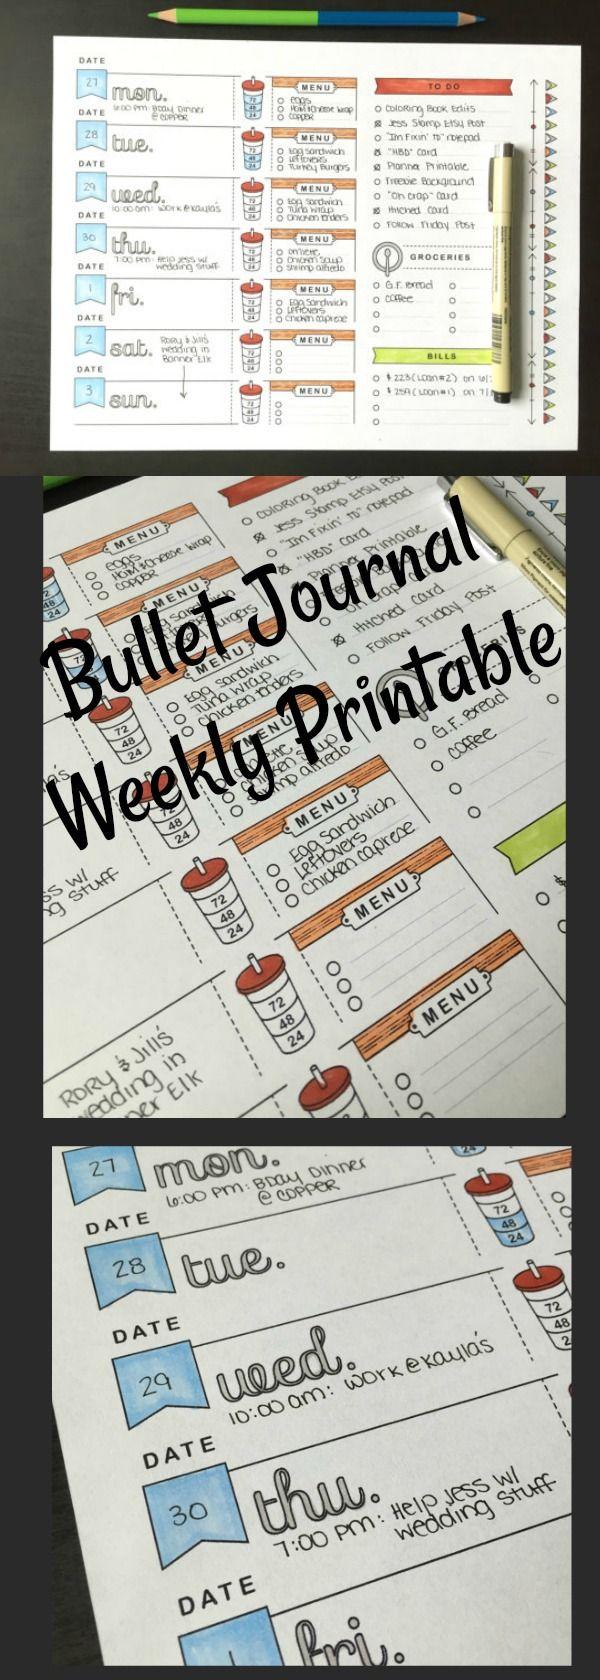 Bullet Journal Weekly Spread ~ A4, Printable Planner Page, Weekly Calendar Template, Bullet Journal Printable, Adult Coloring, To Do List, Grocery List, Meal Planning #affiliate #bulletjournalweeklylog #bujoprintable #plannerpage